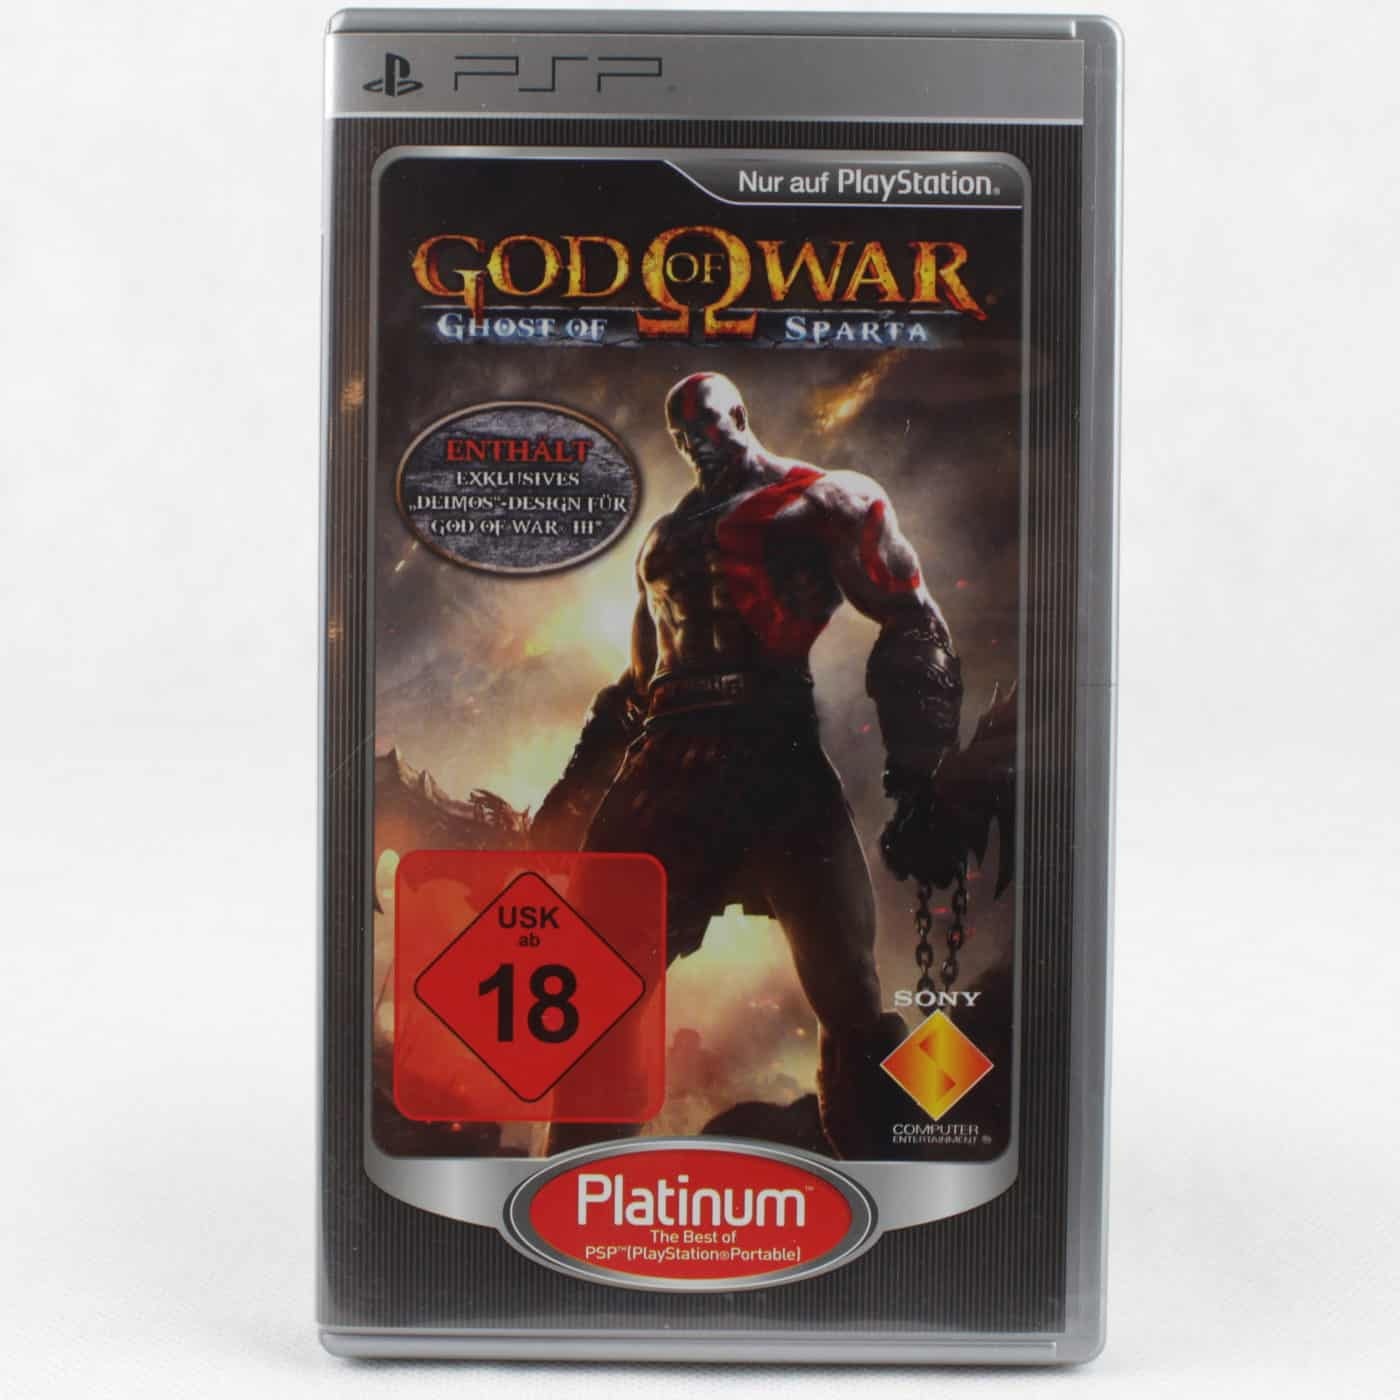 God of War: Ghost of Sparta (Sony PSP - Platinum - Tysk)